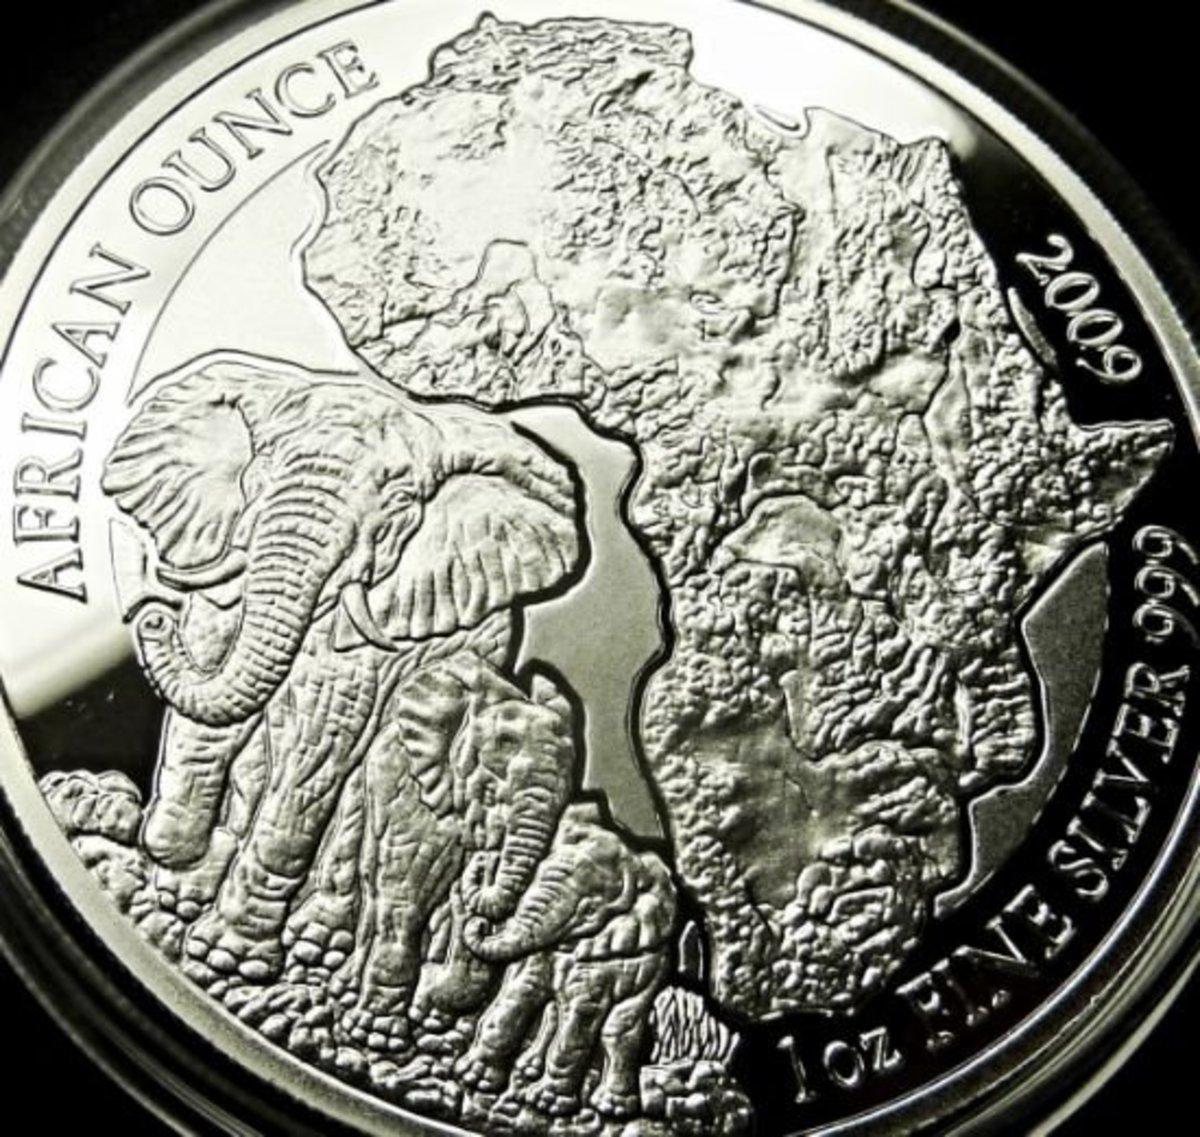 2009 Rwanda Silver Elephant Proof Coin